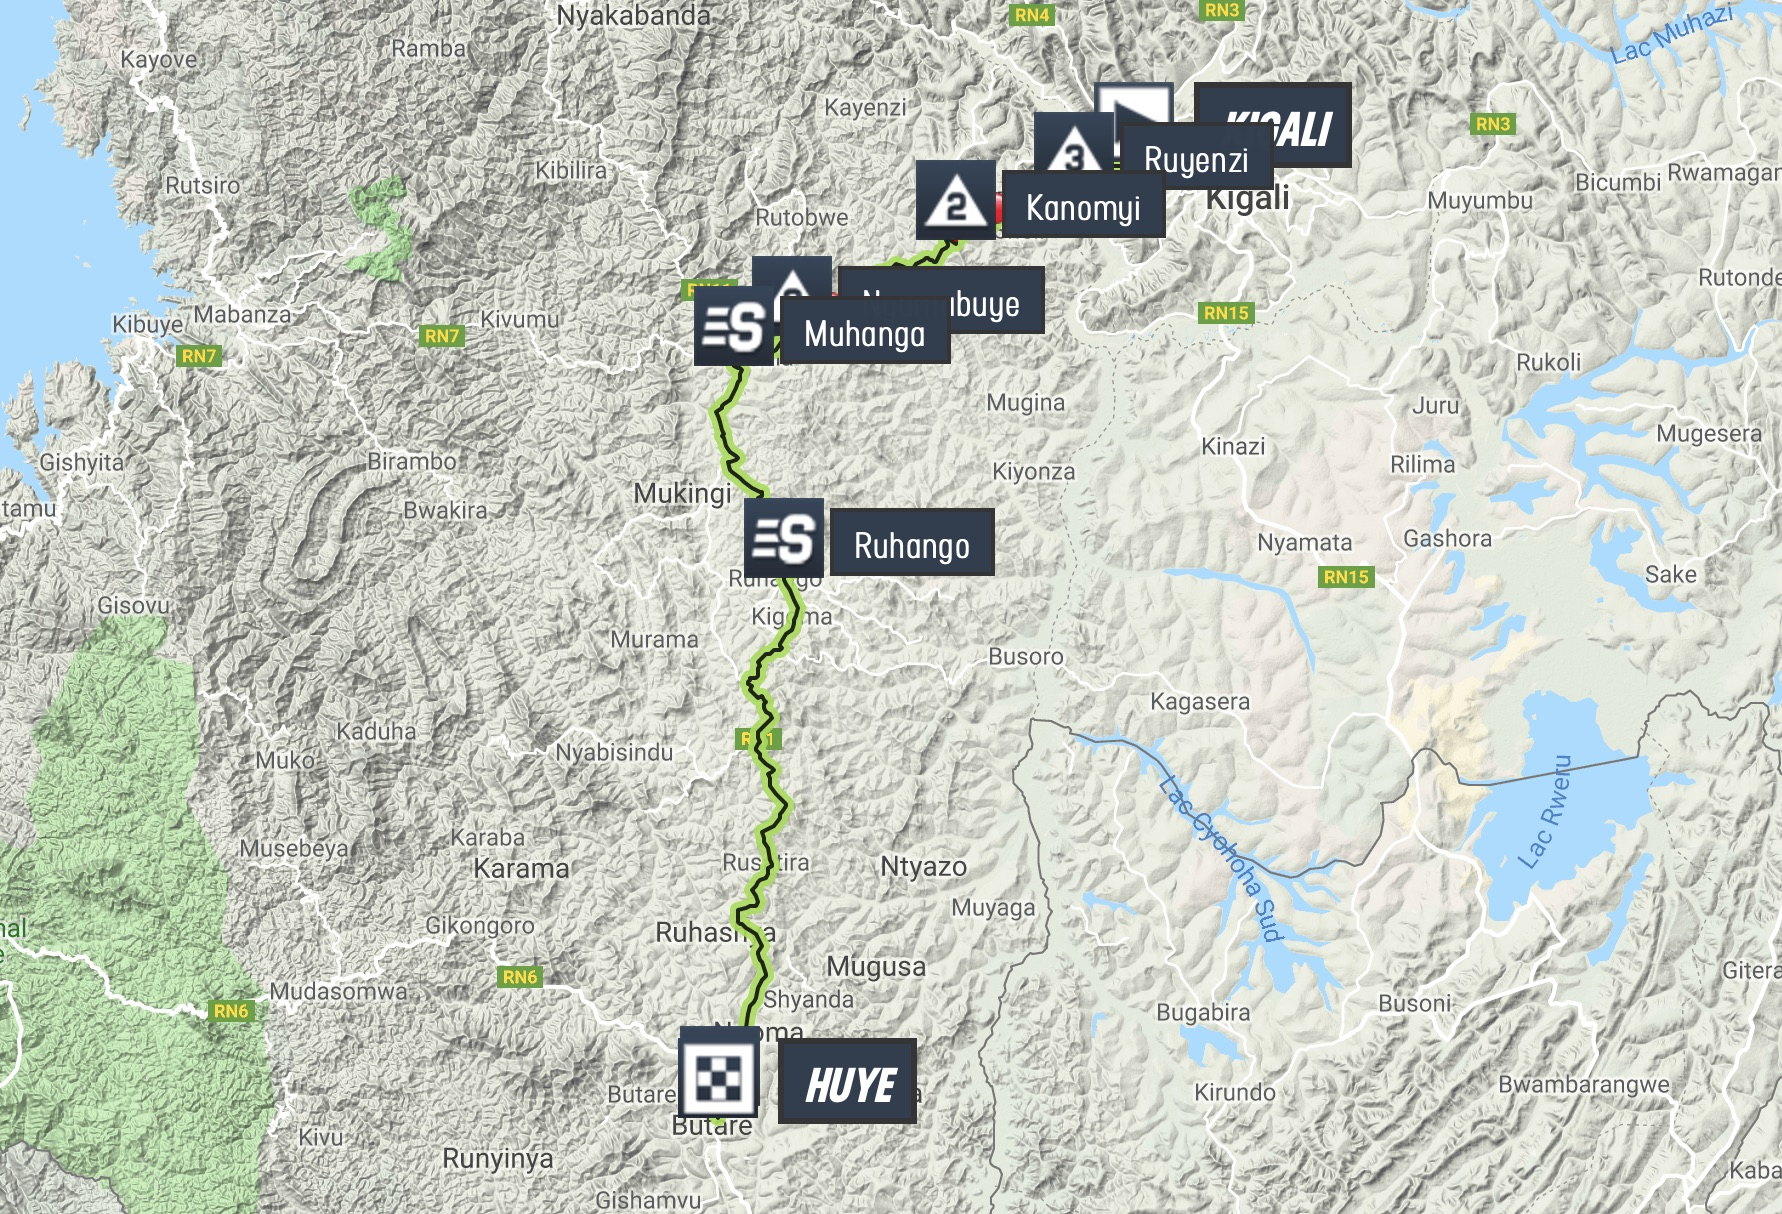 https://www.procyclingstats.com/images/profiles/ap/bd/tour-of-rwanda-2019-stage-2-map-cd6c083c40.jpg